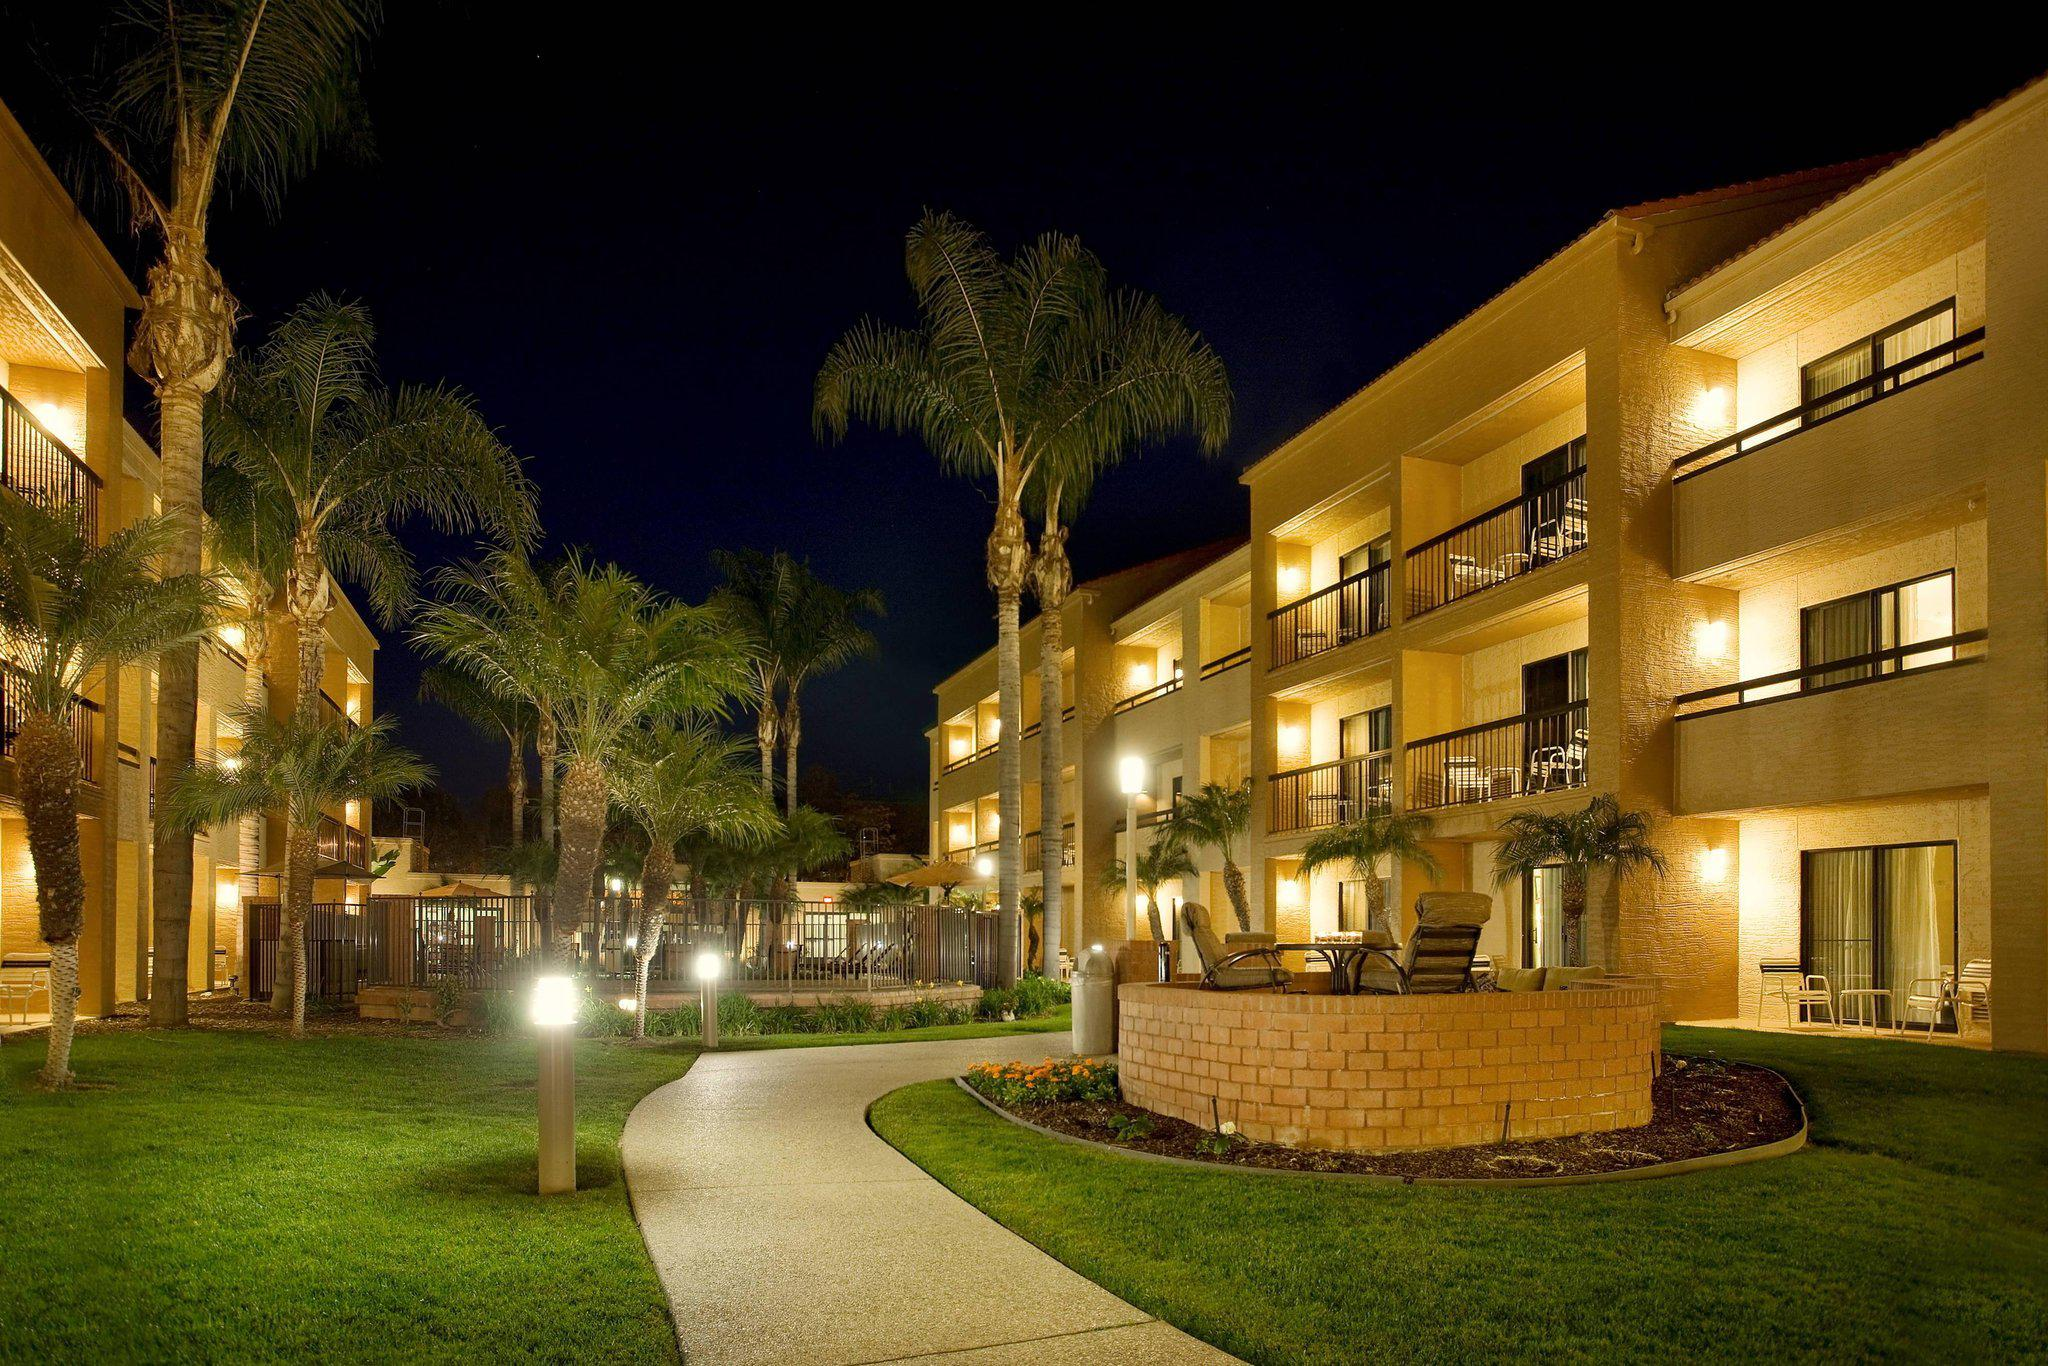 Courtyard by Marriott San Diego Sorrento Valley